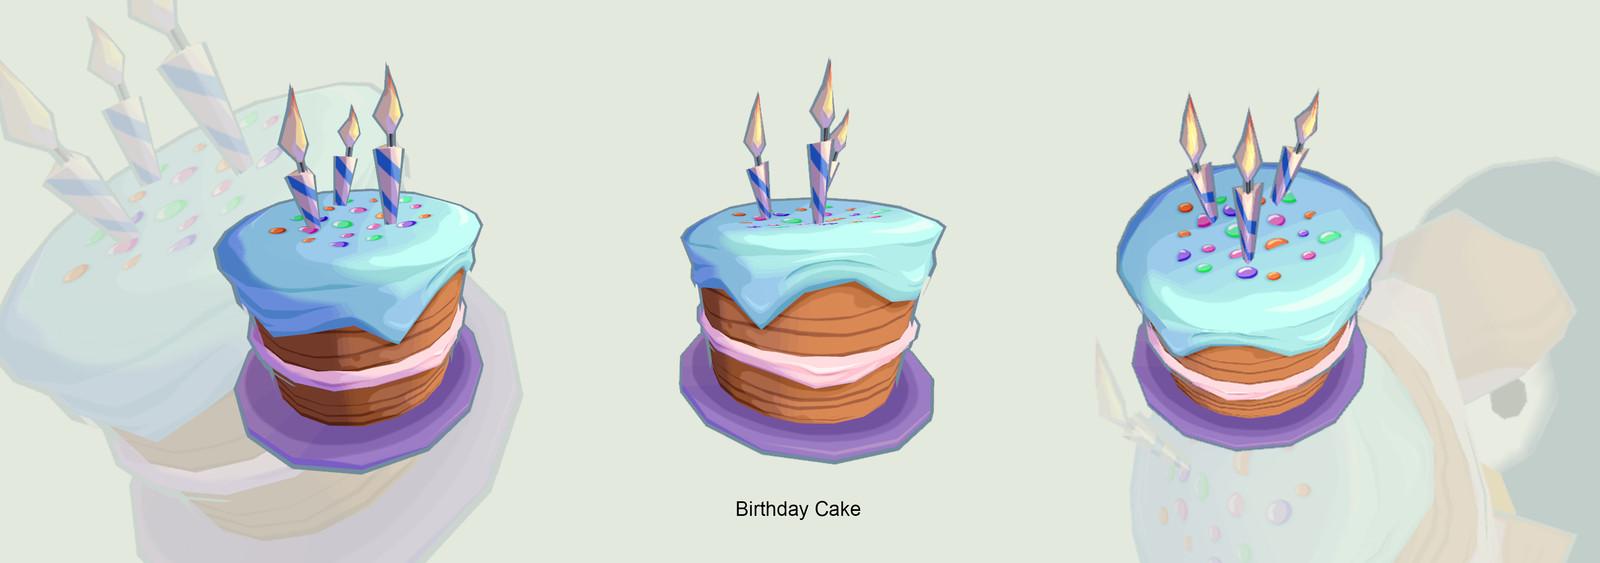 Penguin Birthday cake Model and texture